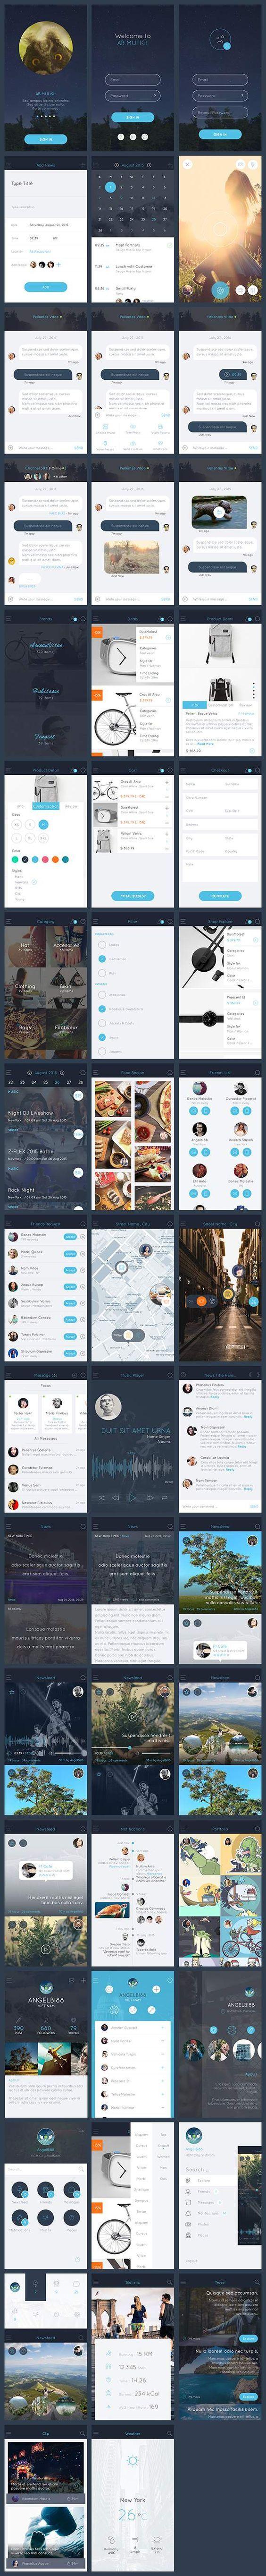 app, app design, bundle, ios 8, ios 9, iphone 6, minimalist, mobile, quality, ui, ui design, ui kit, ux: